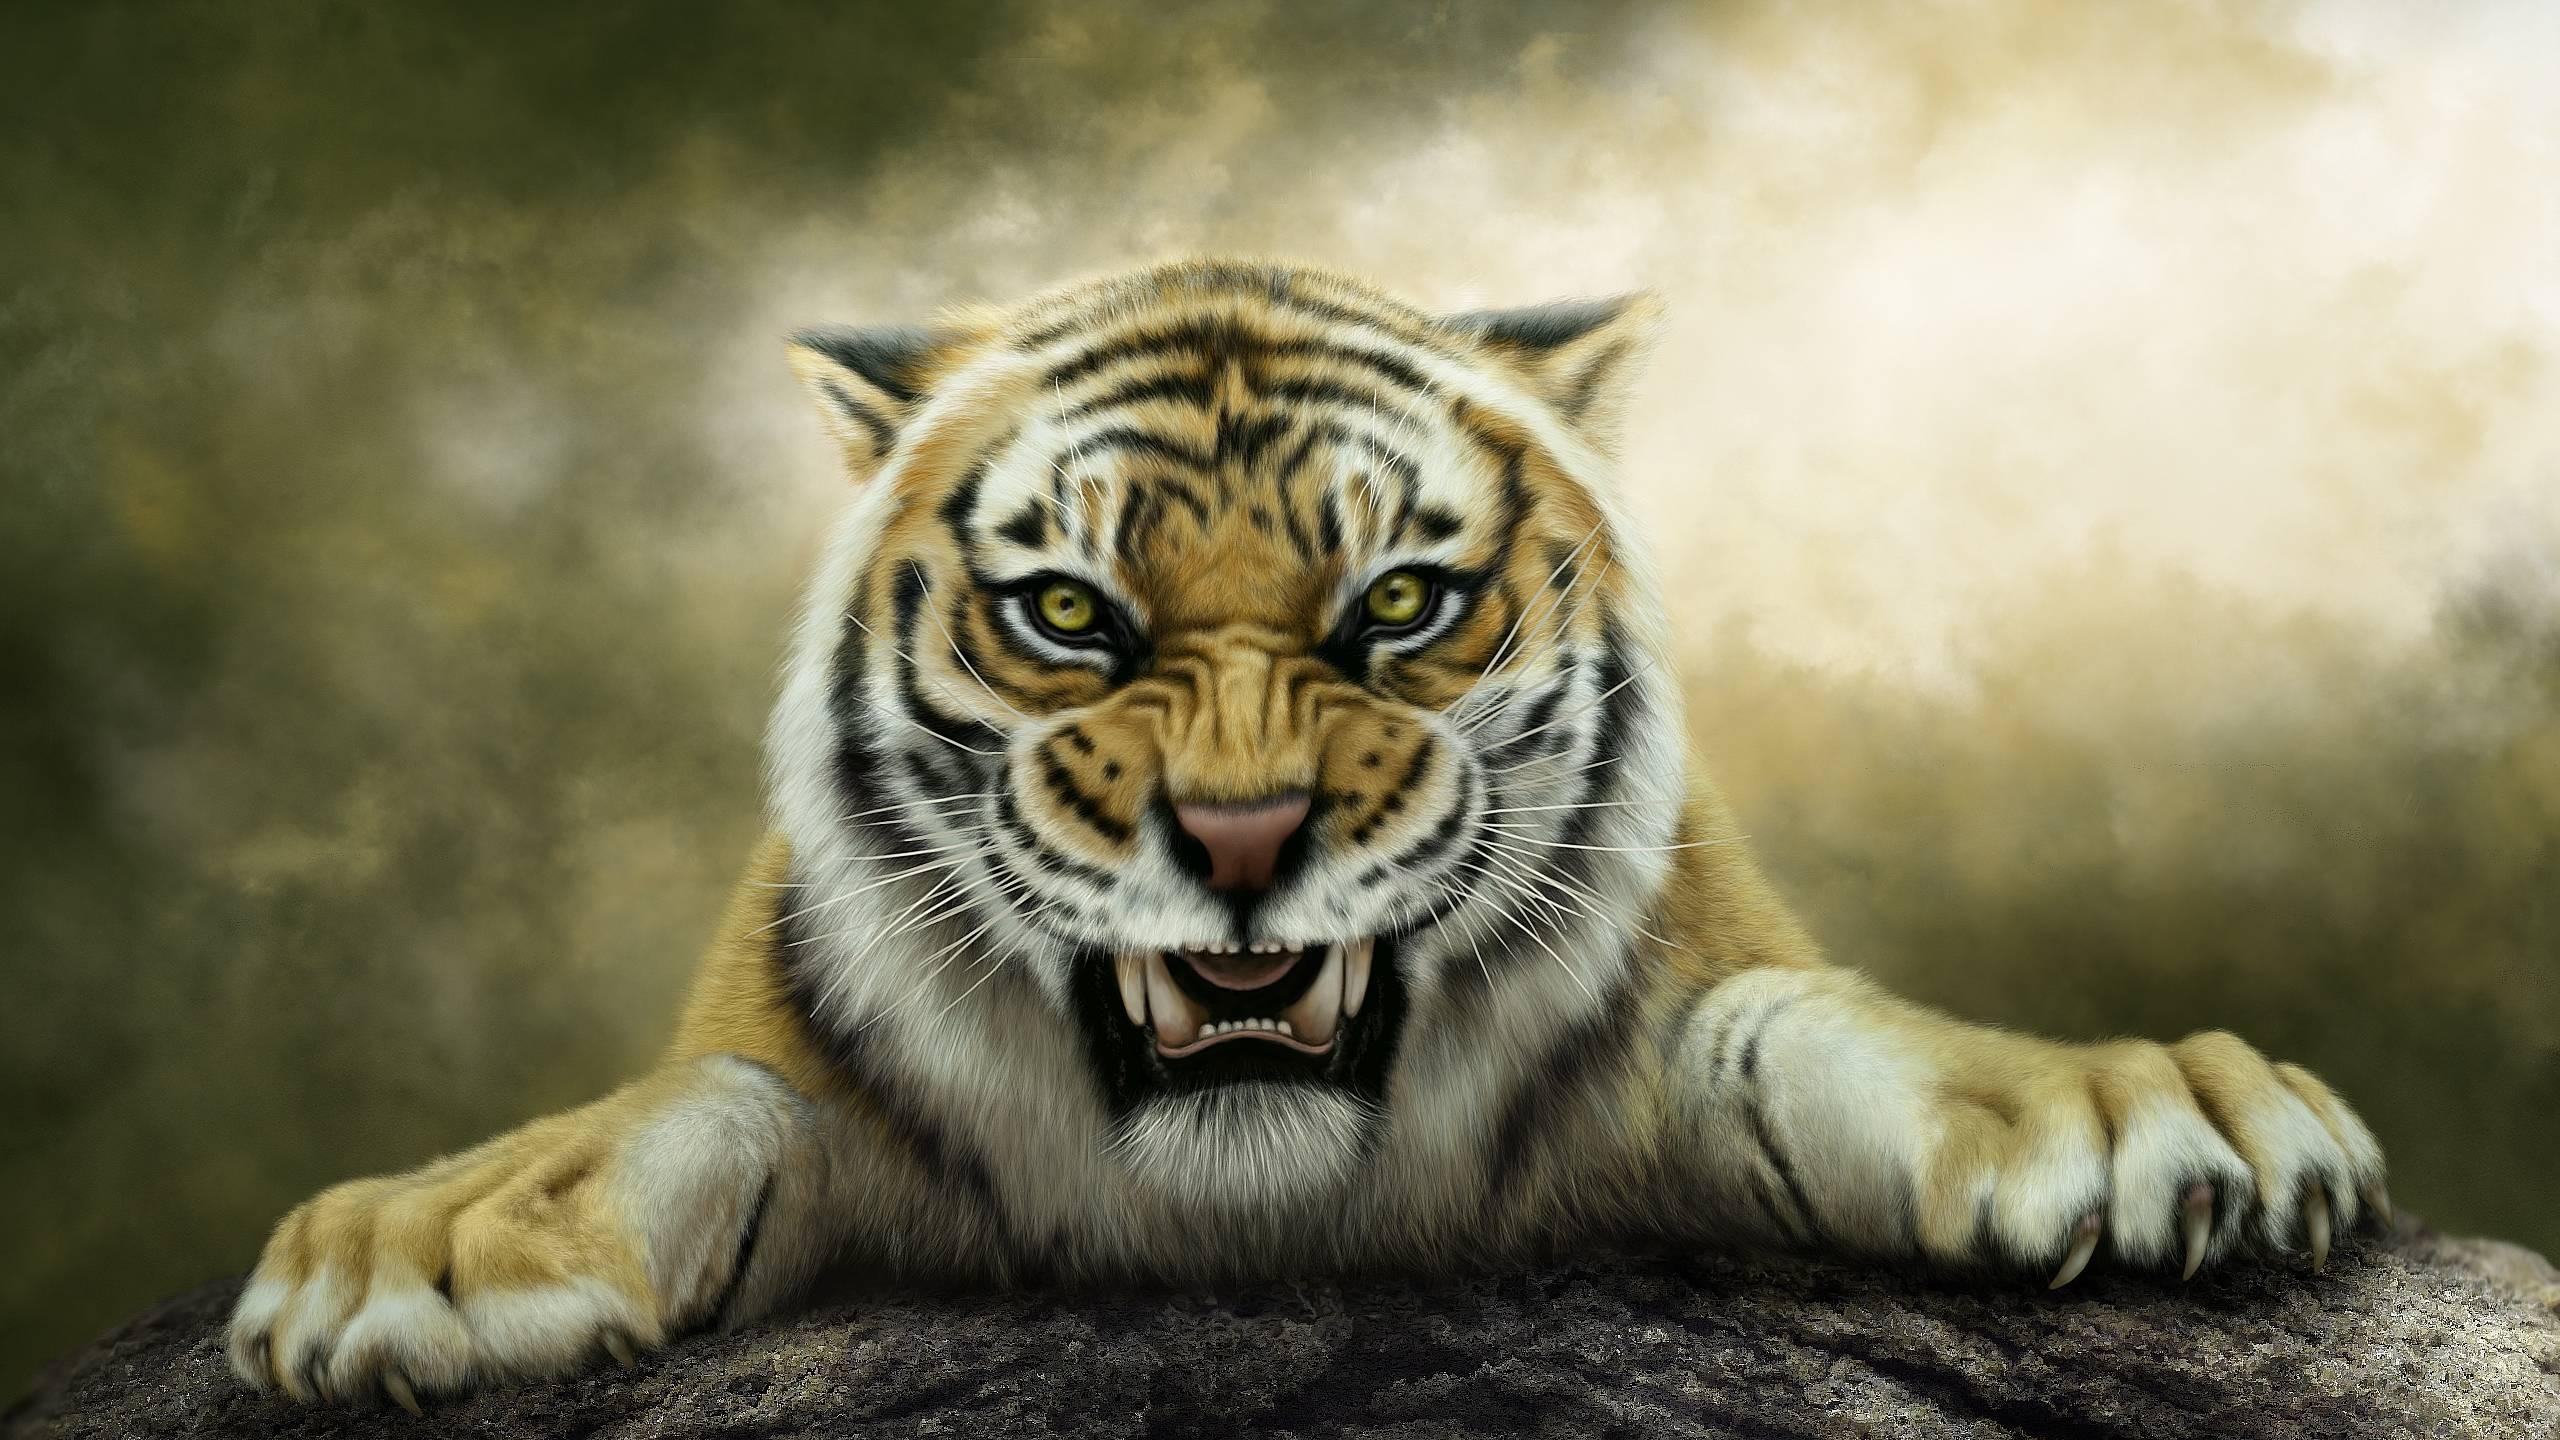 тигр оскал морда загрузить